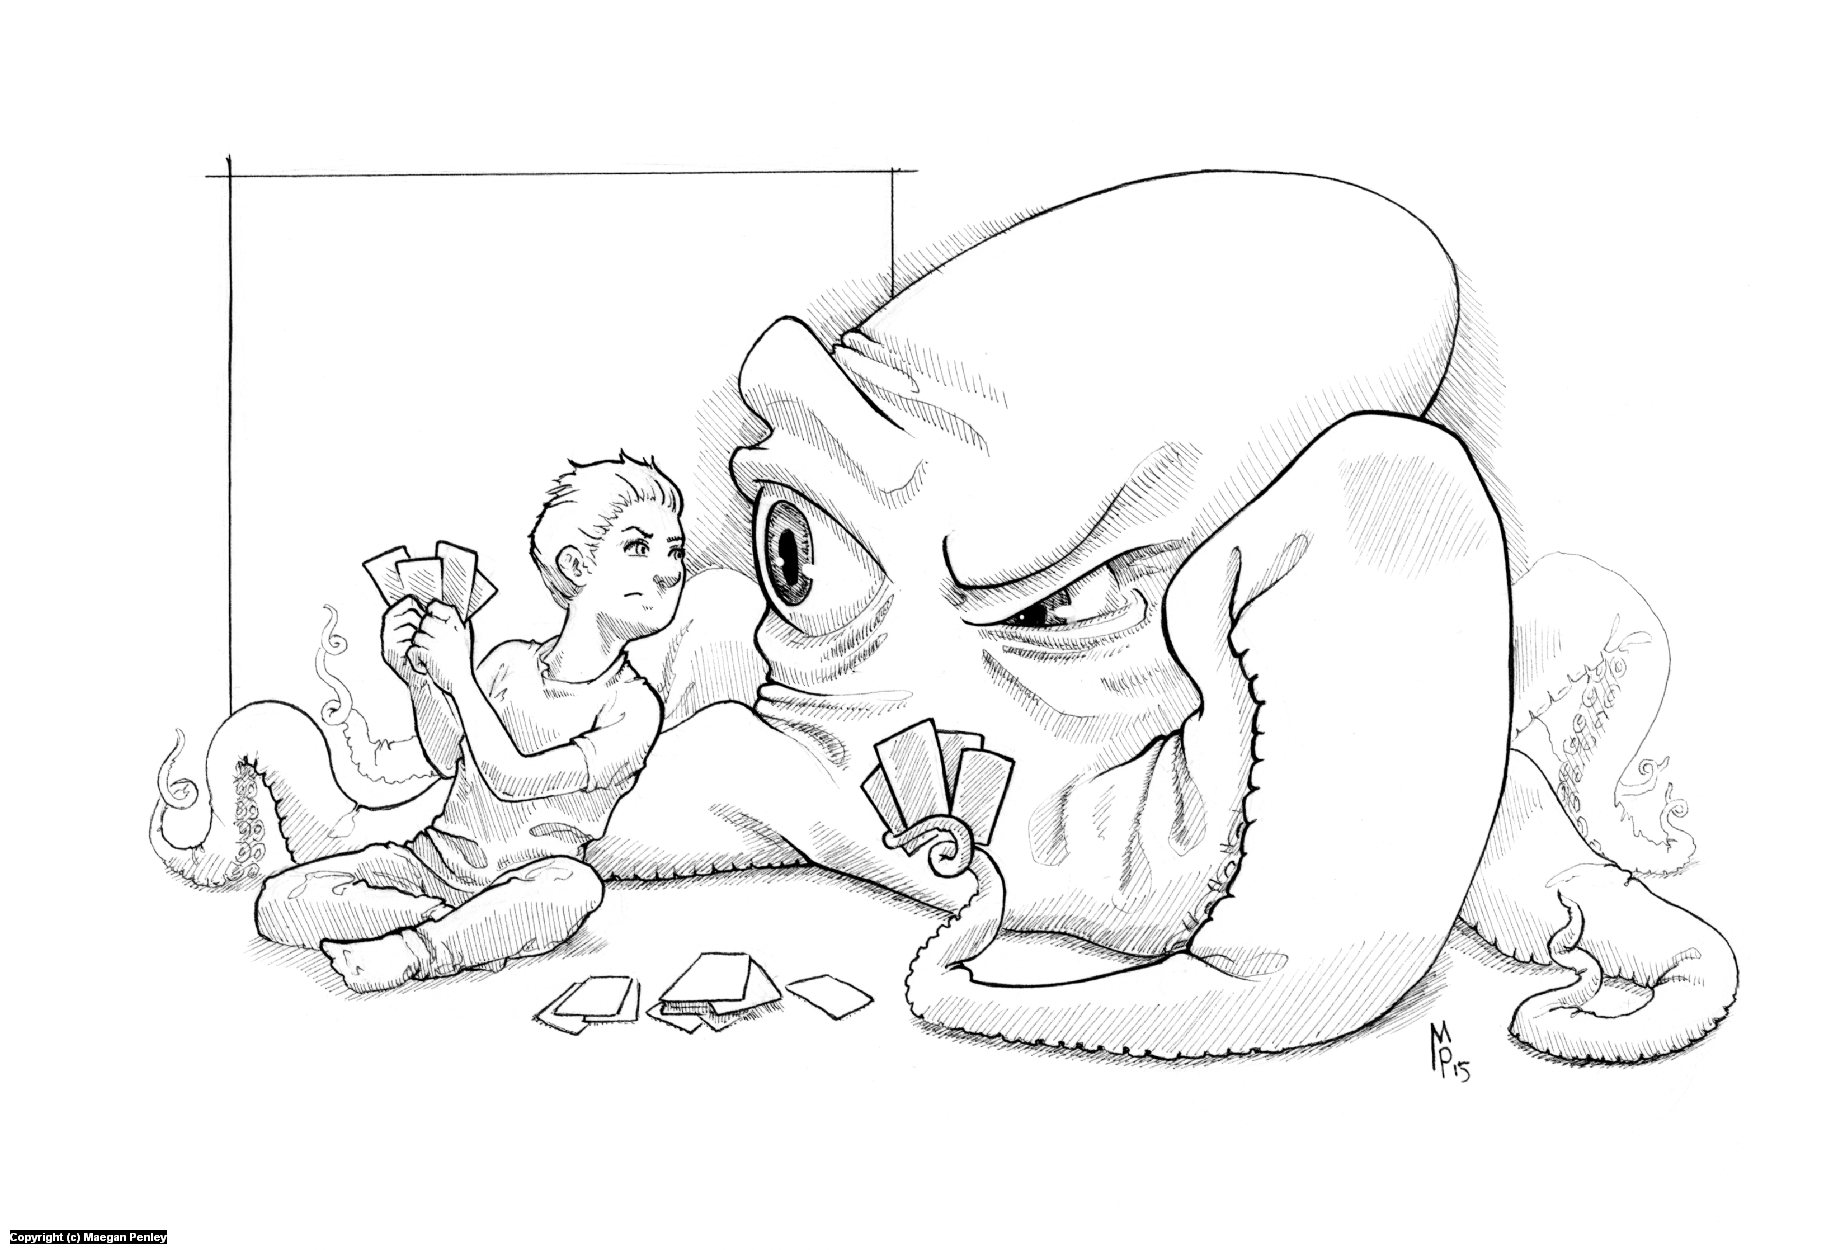 Cheater! Artwork by Maegan Penley